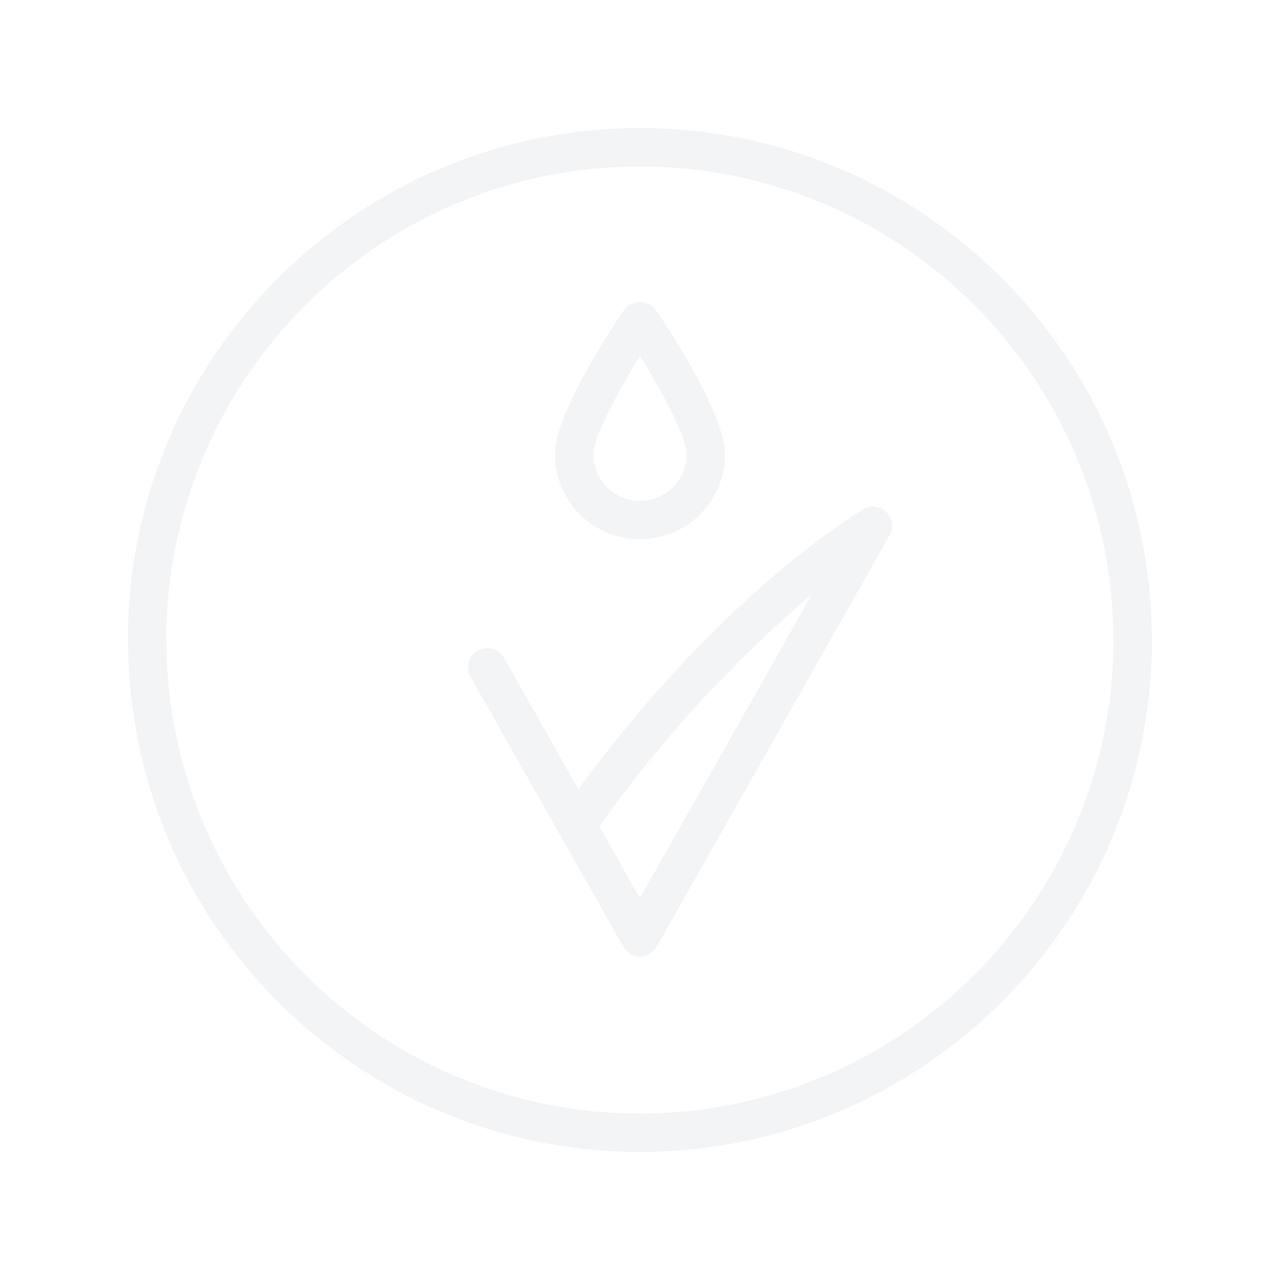 Maybelline Affinitone Powder 9g